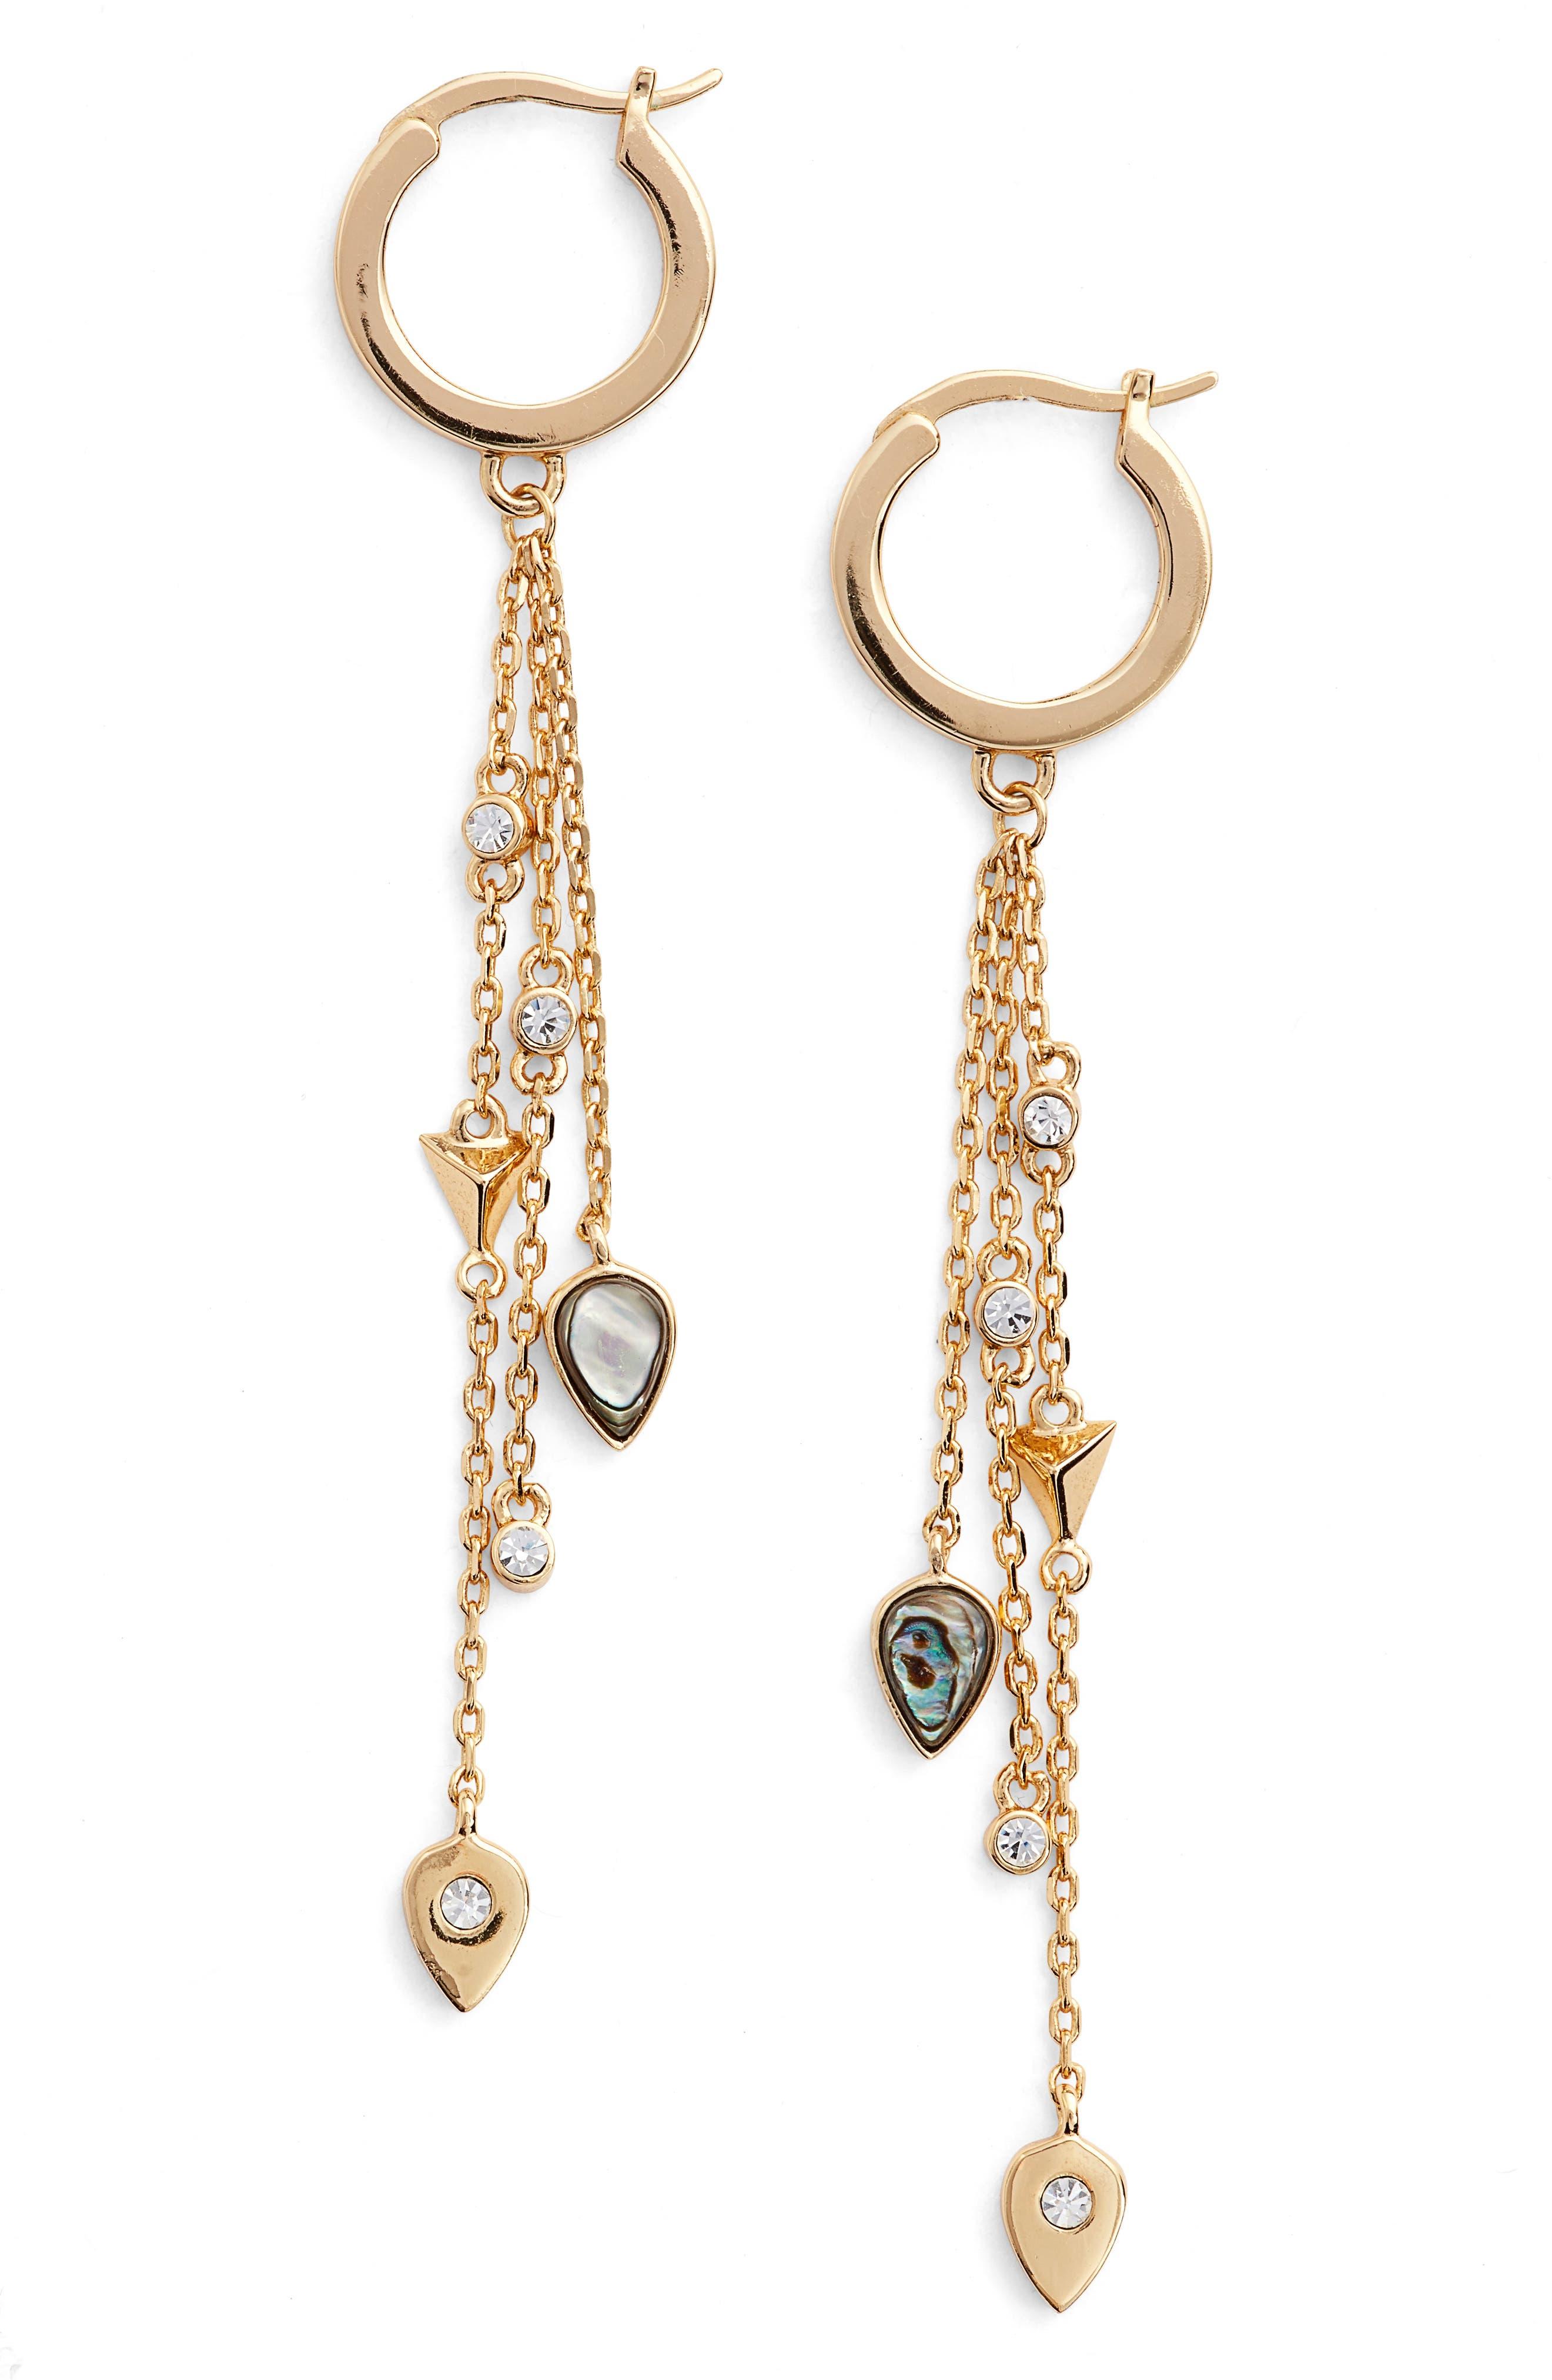 Owen Drop Earrings,                             Main thumbnail 1, color,                             Gold/ Abalone